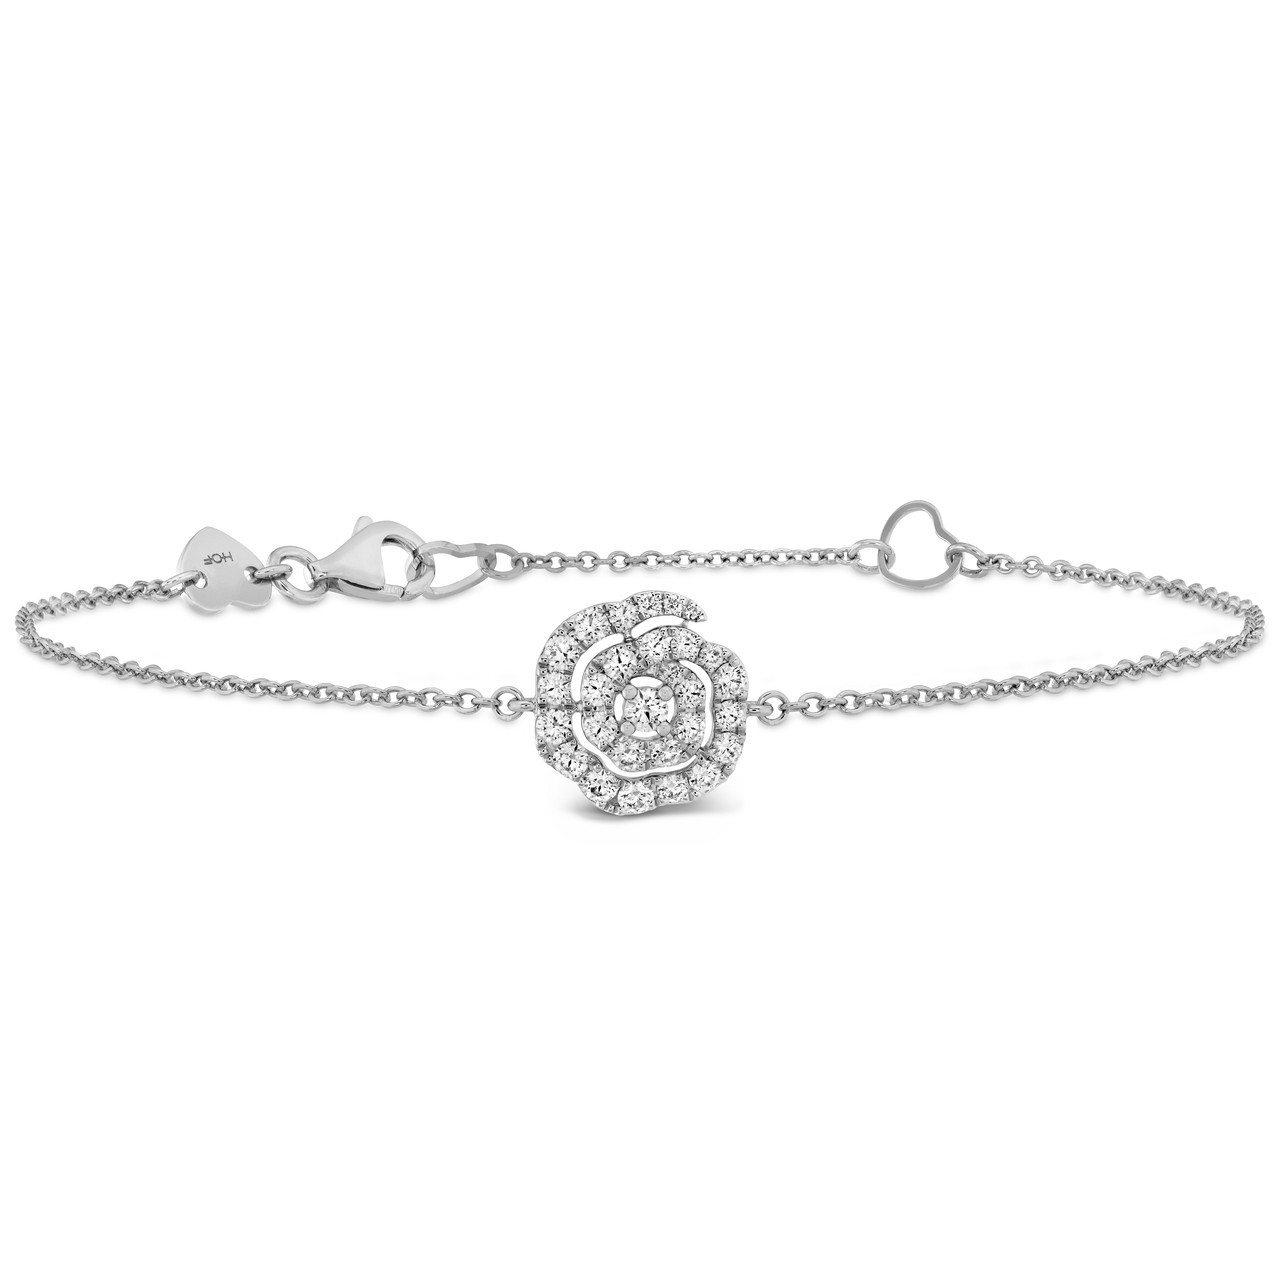 LORELEI慈善珠寶系列手鍊,白K金鑲嵌鑽石總重約0.27克拉,54,000元...